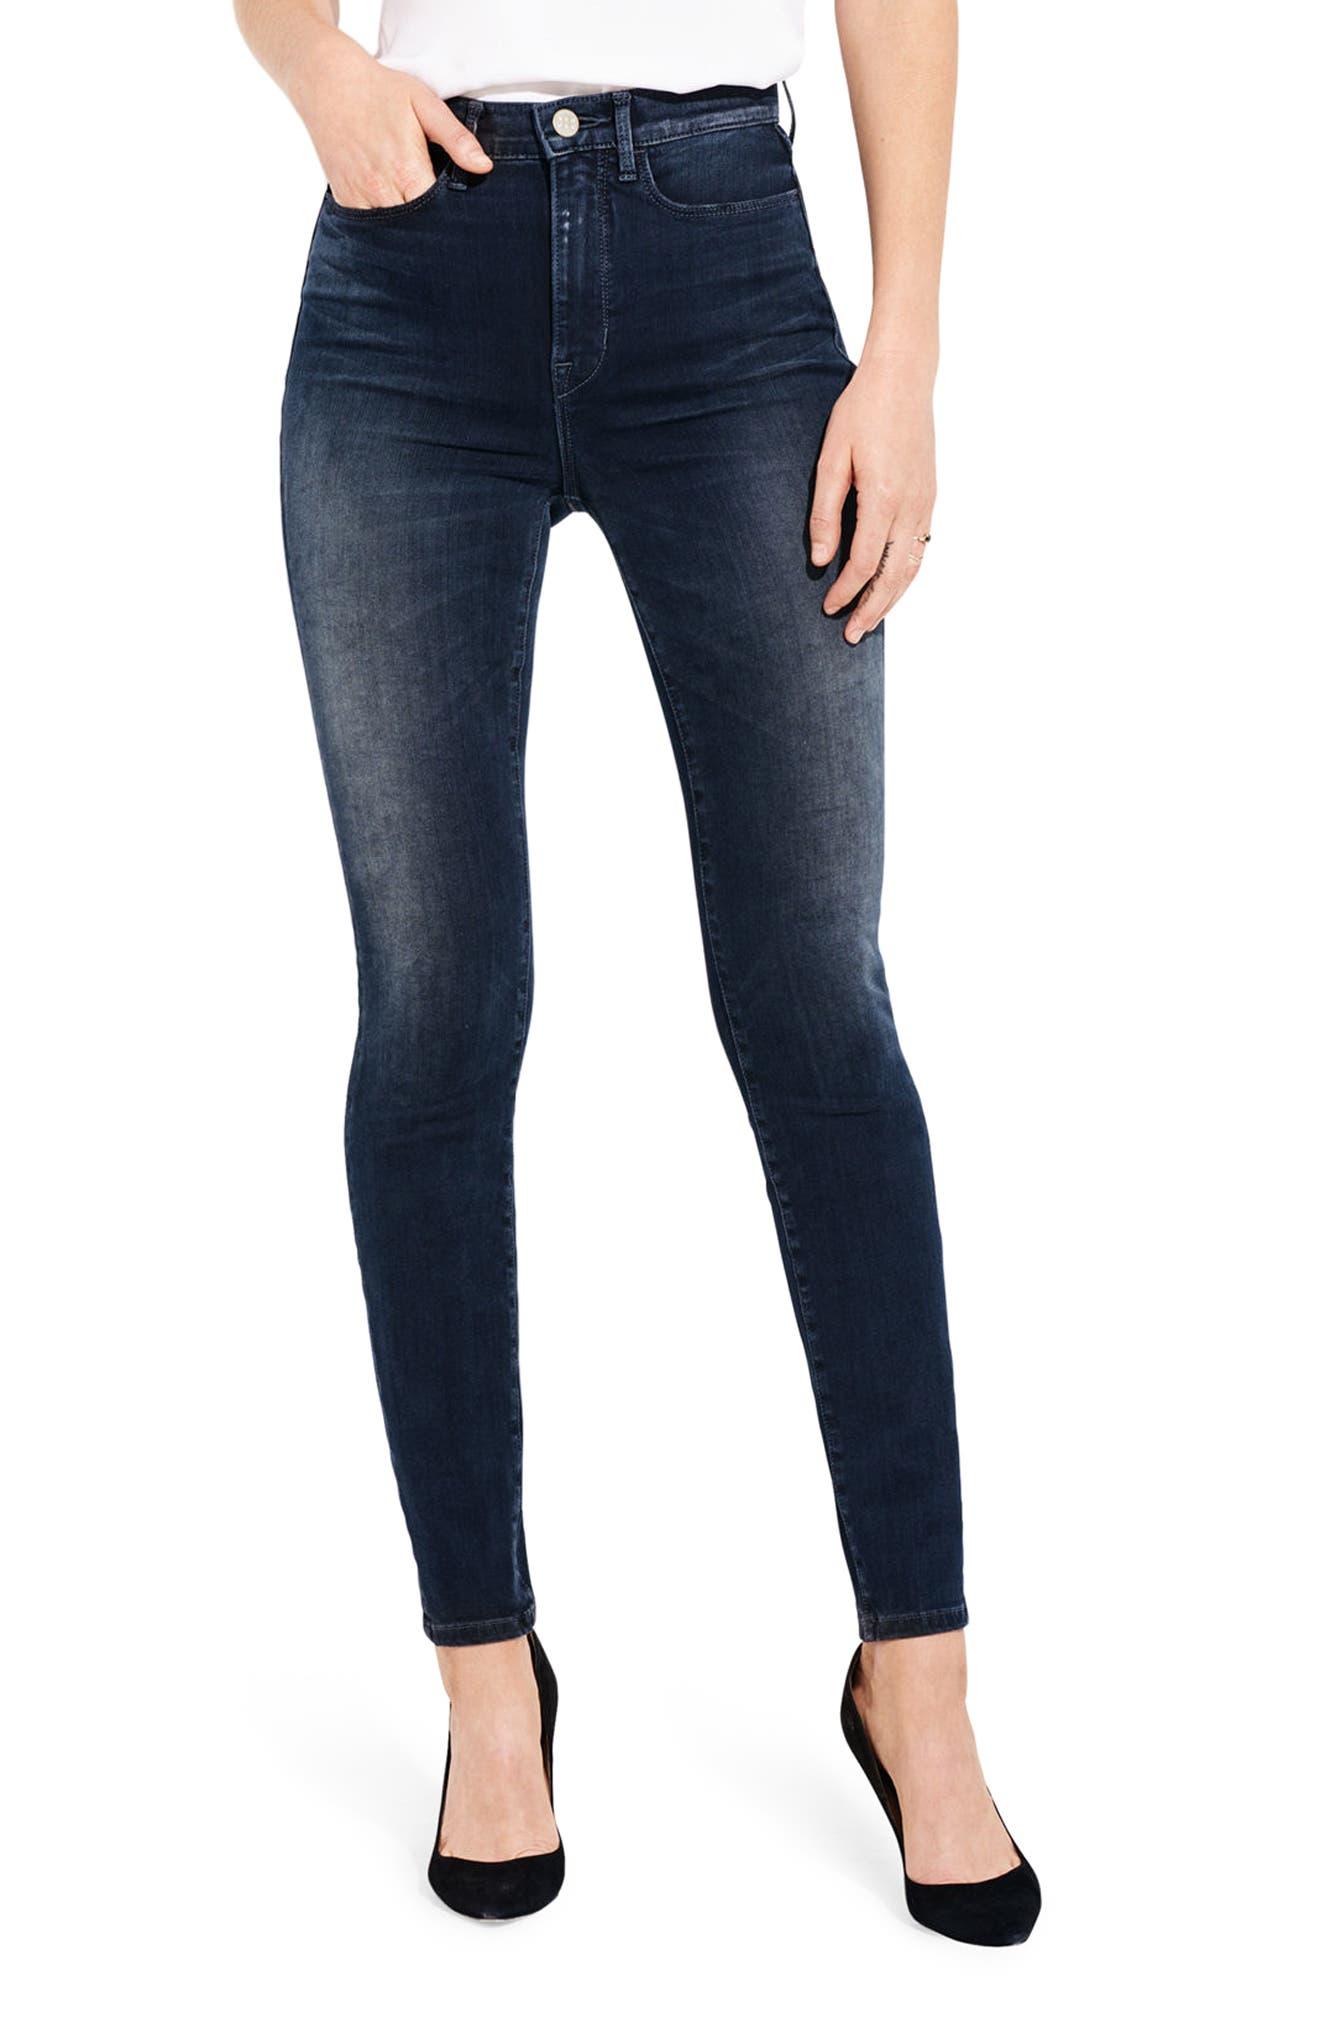 Main Image - AYR The Riser High Waist Skinny Jeans (Jaguar Legs)